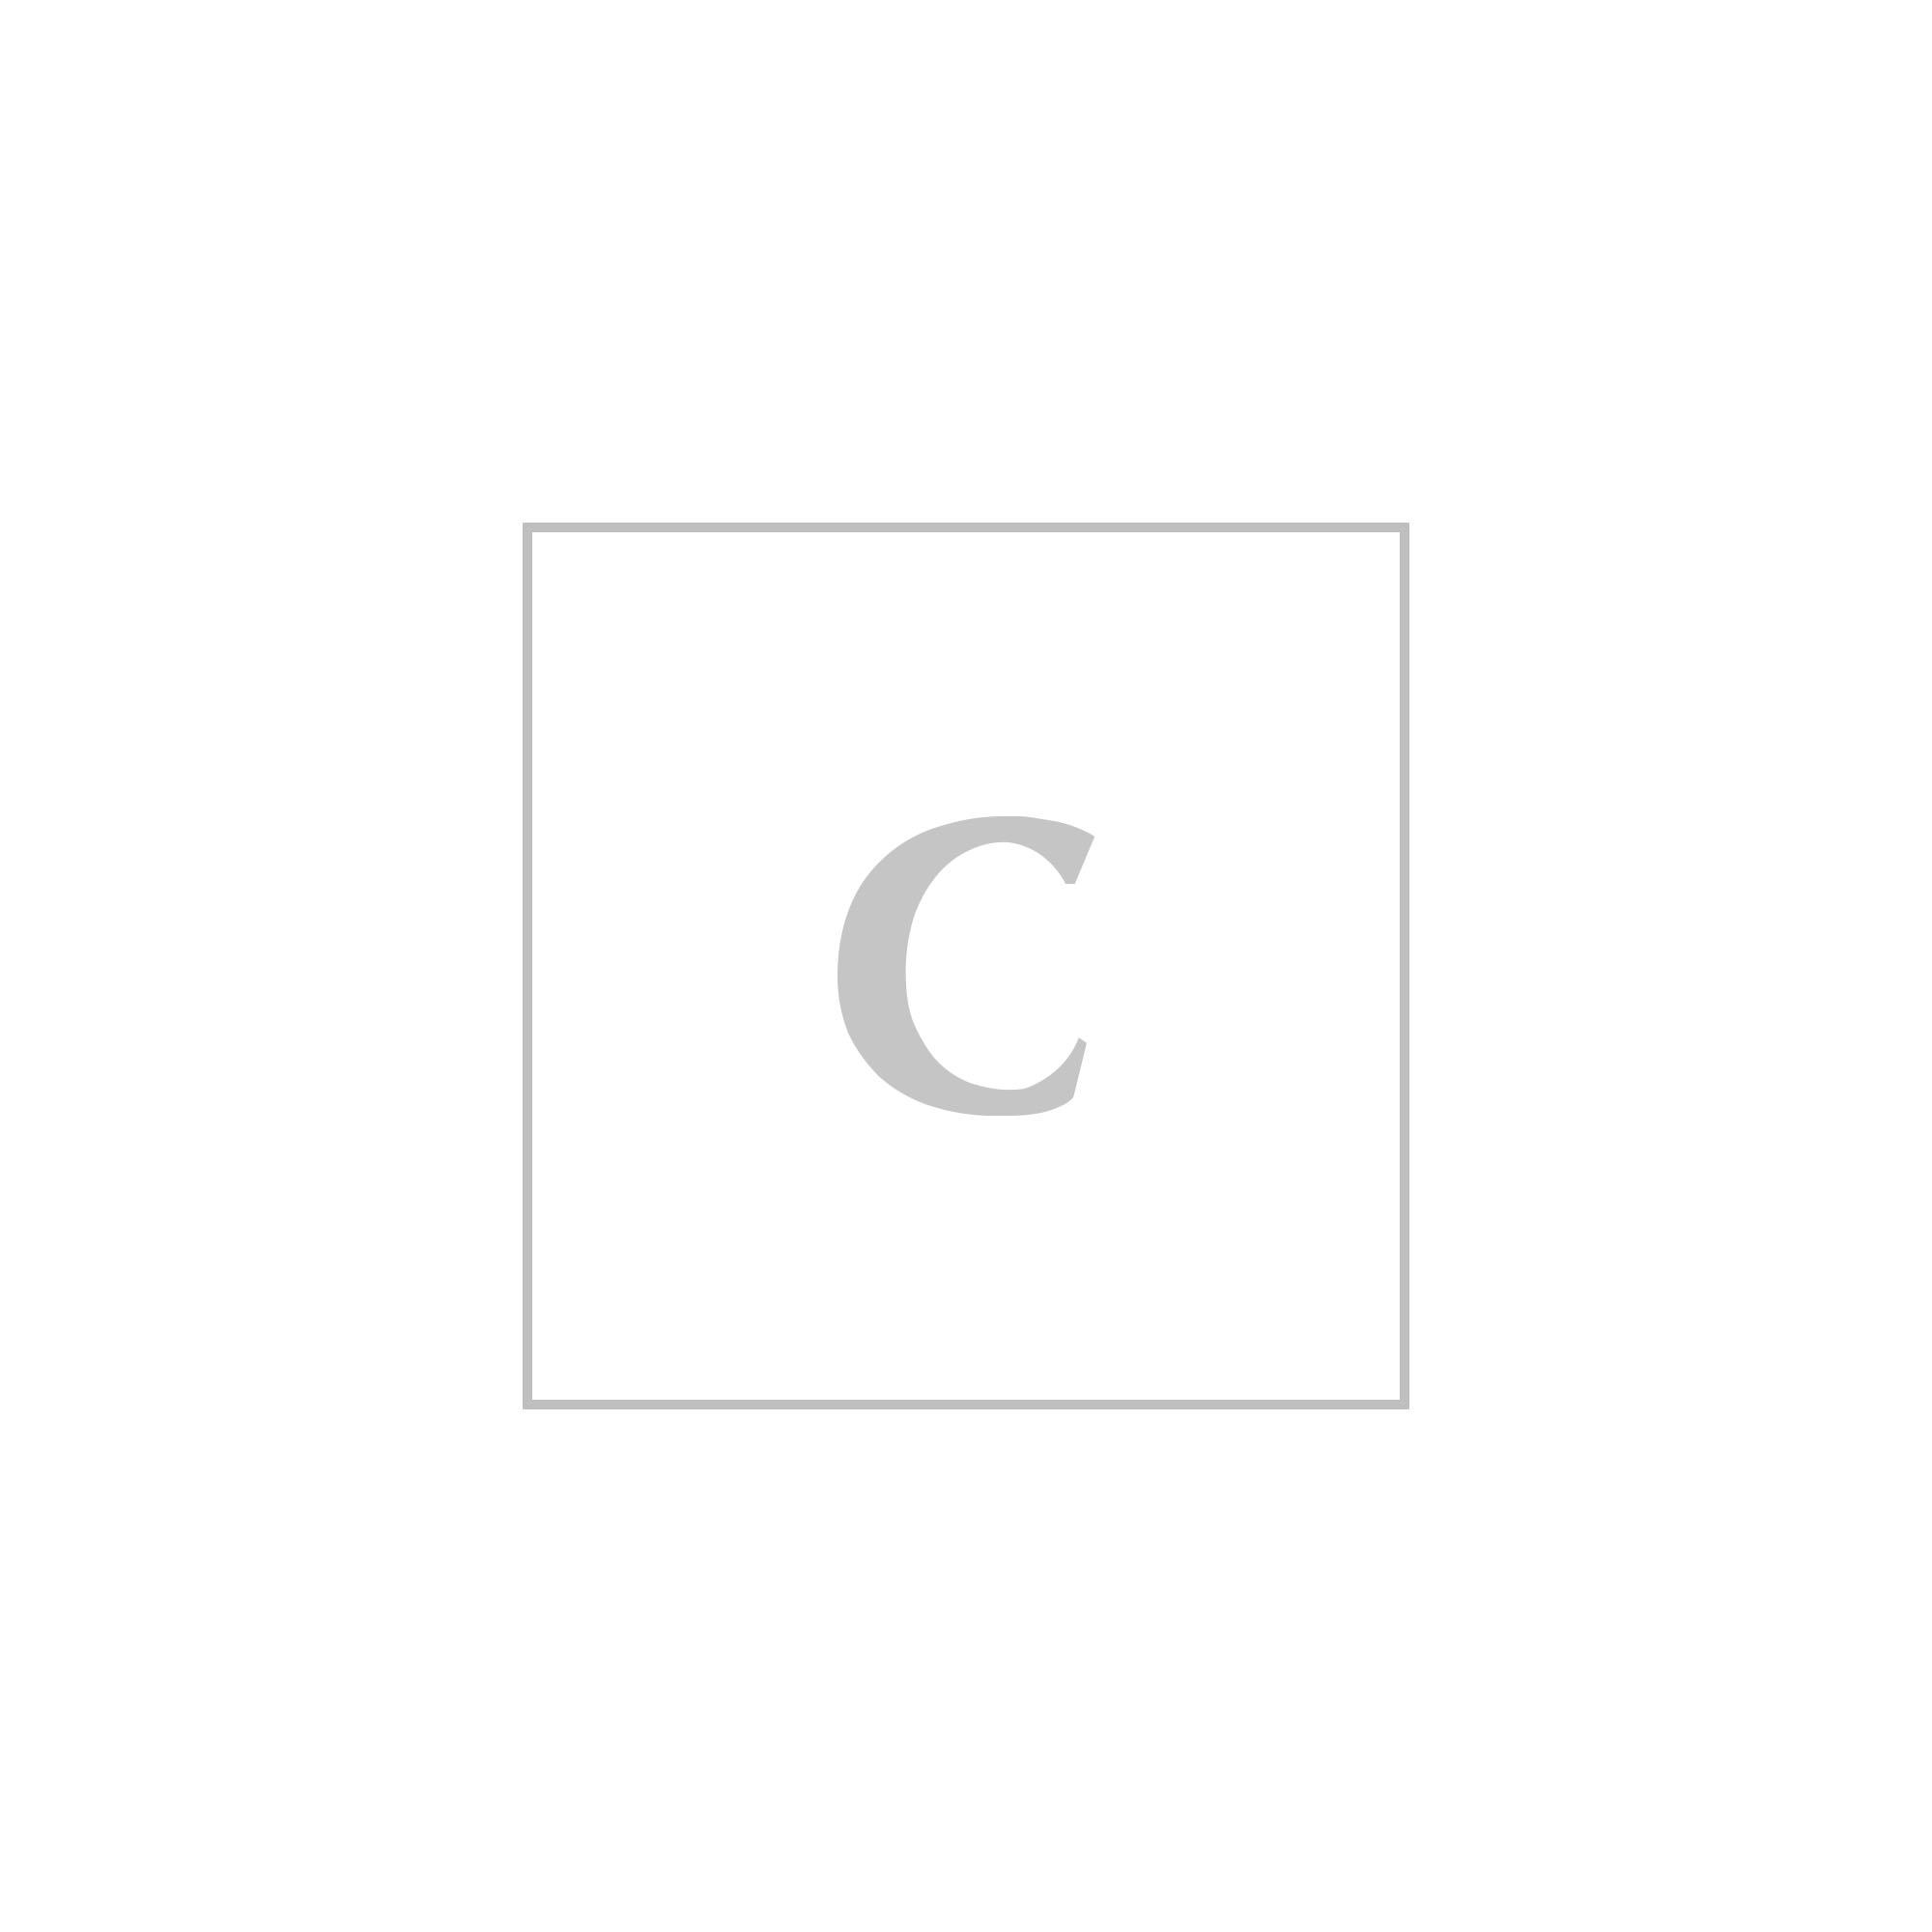 Versace giubbotto piumino